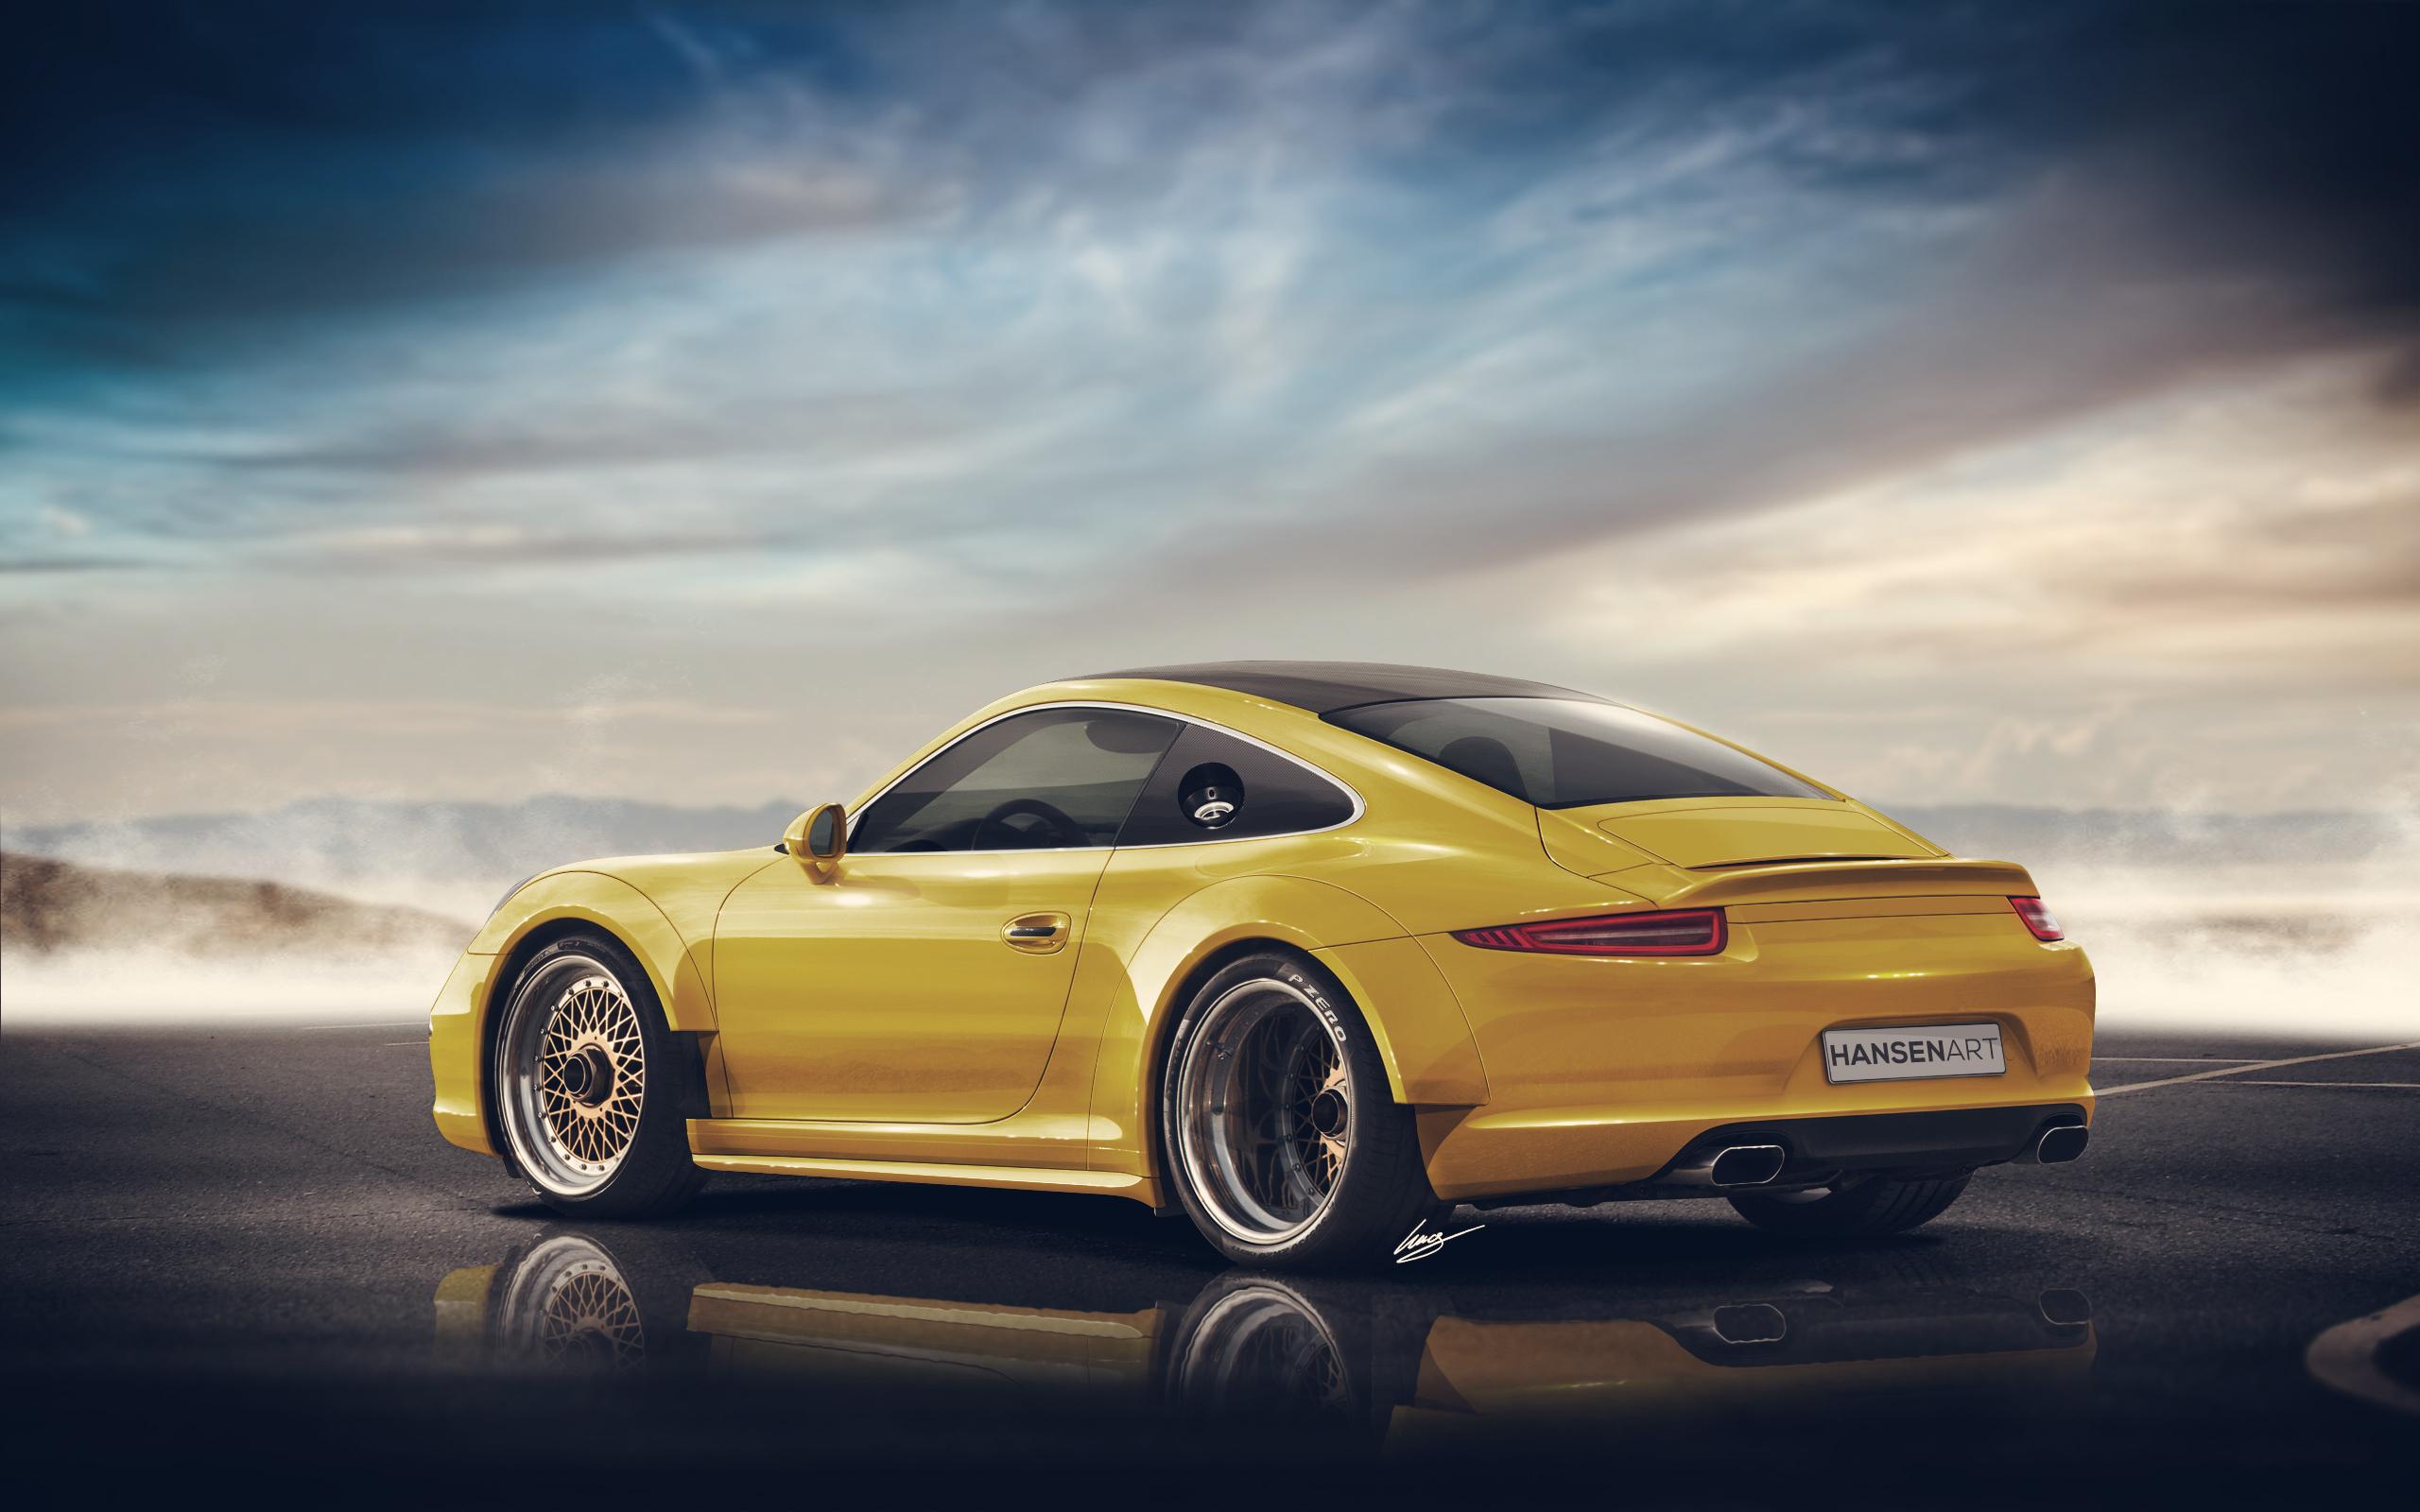 Porsche 911 Widebody Wallpaper Hd Car Wallpapers